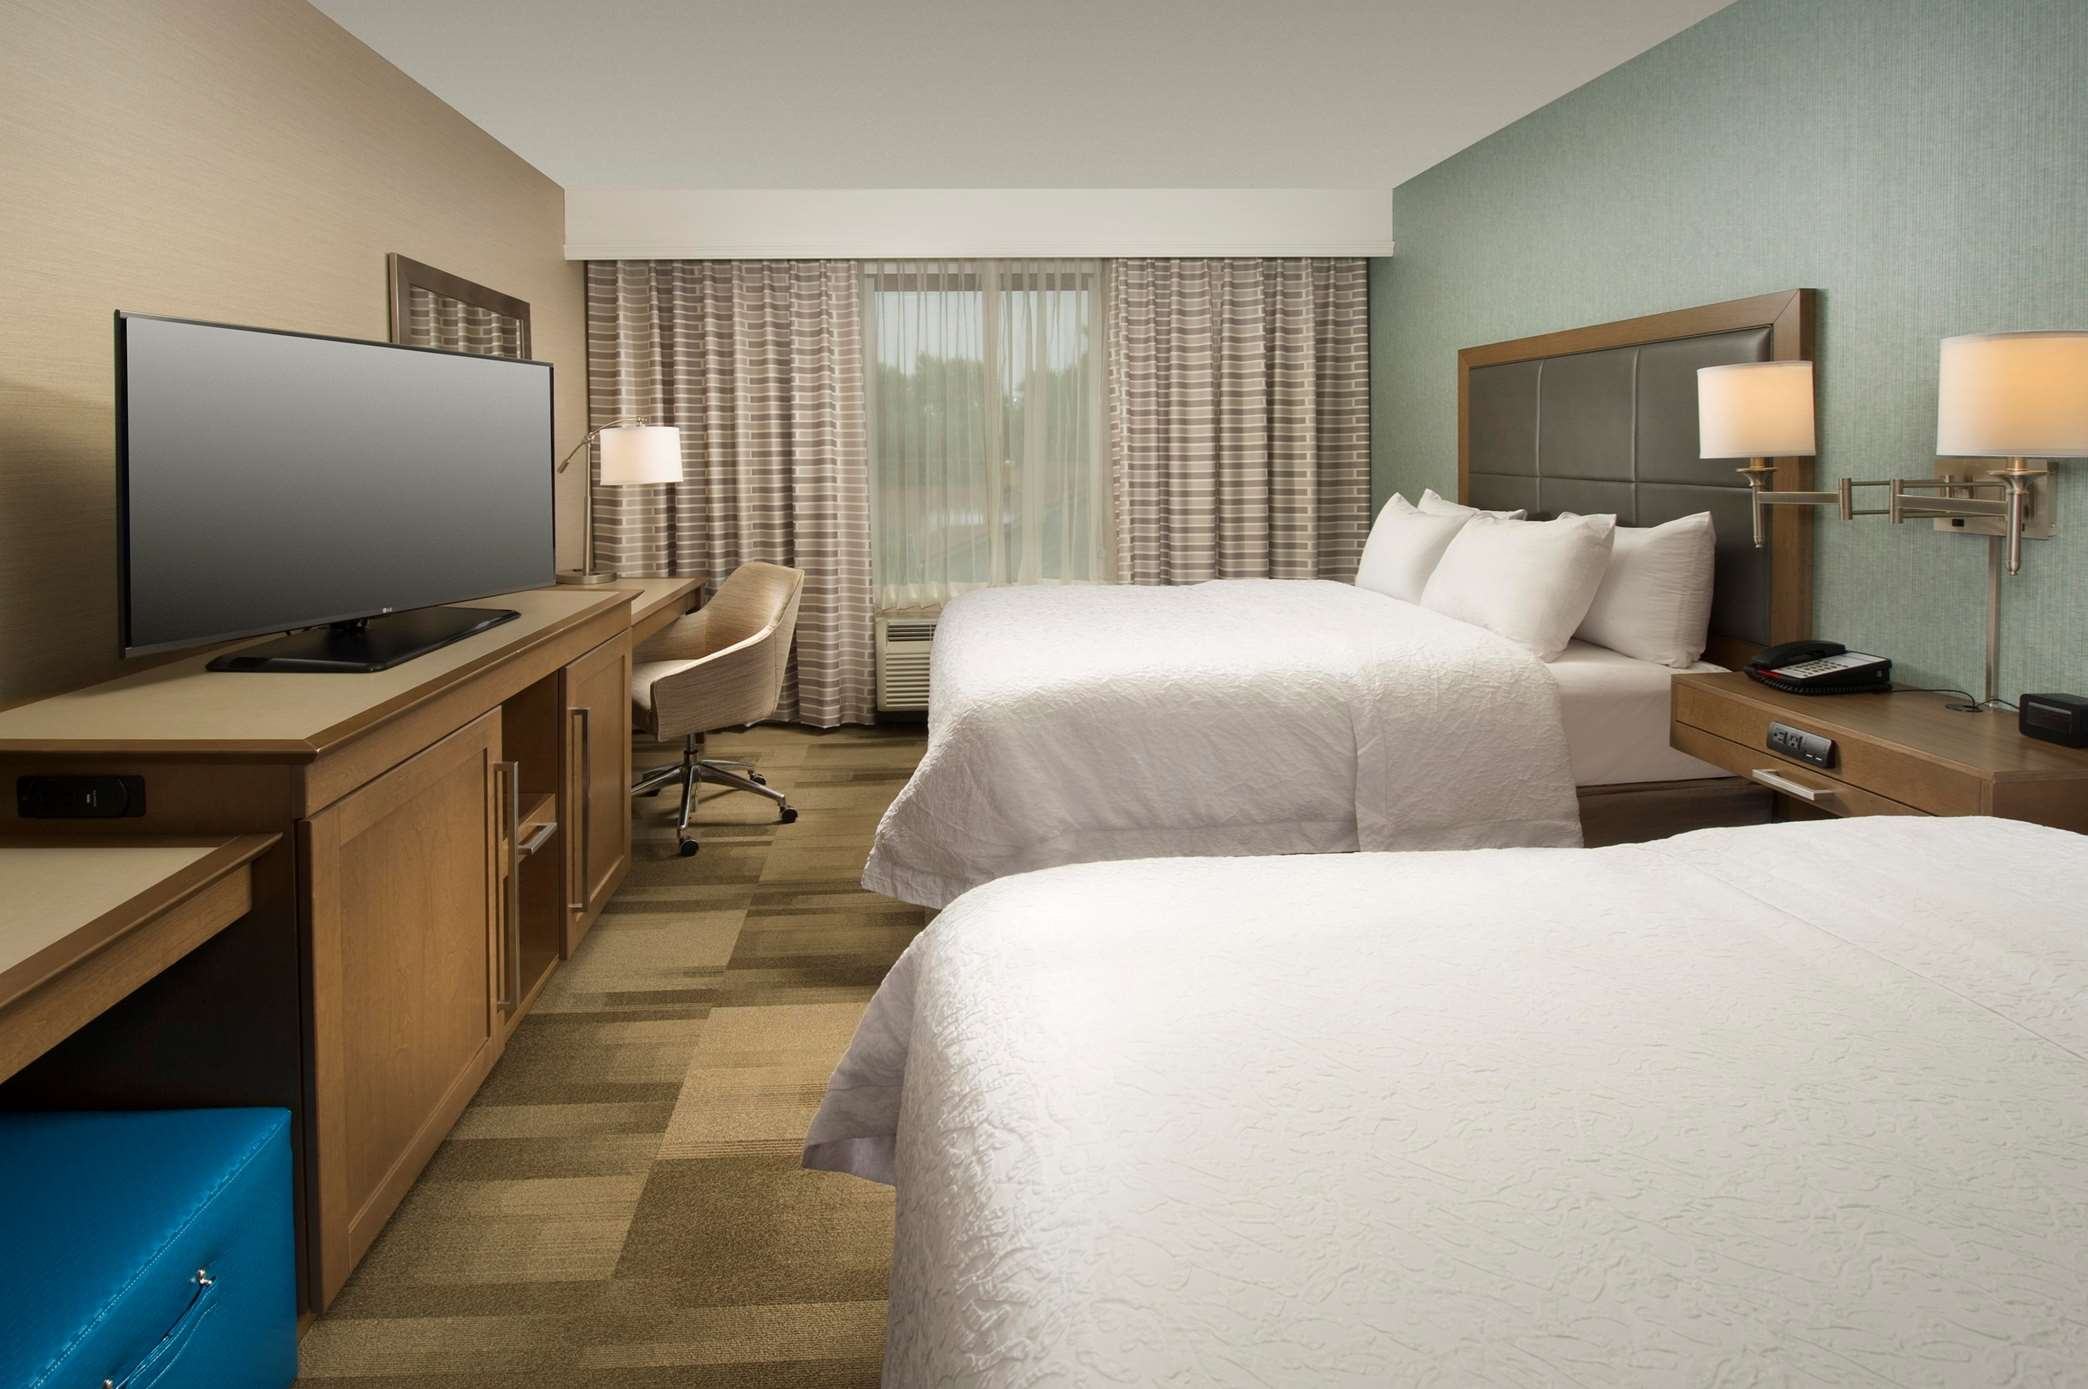 Hampton Inn & Suites Syracuse/Carrier Circle image 6